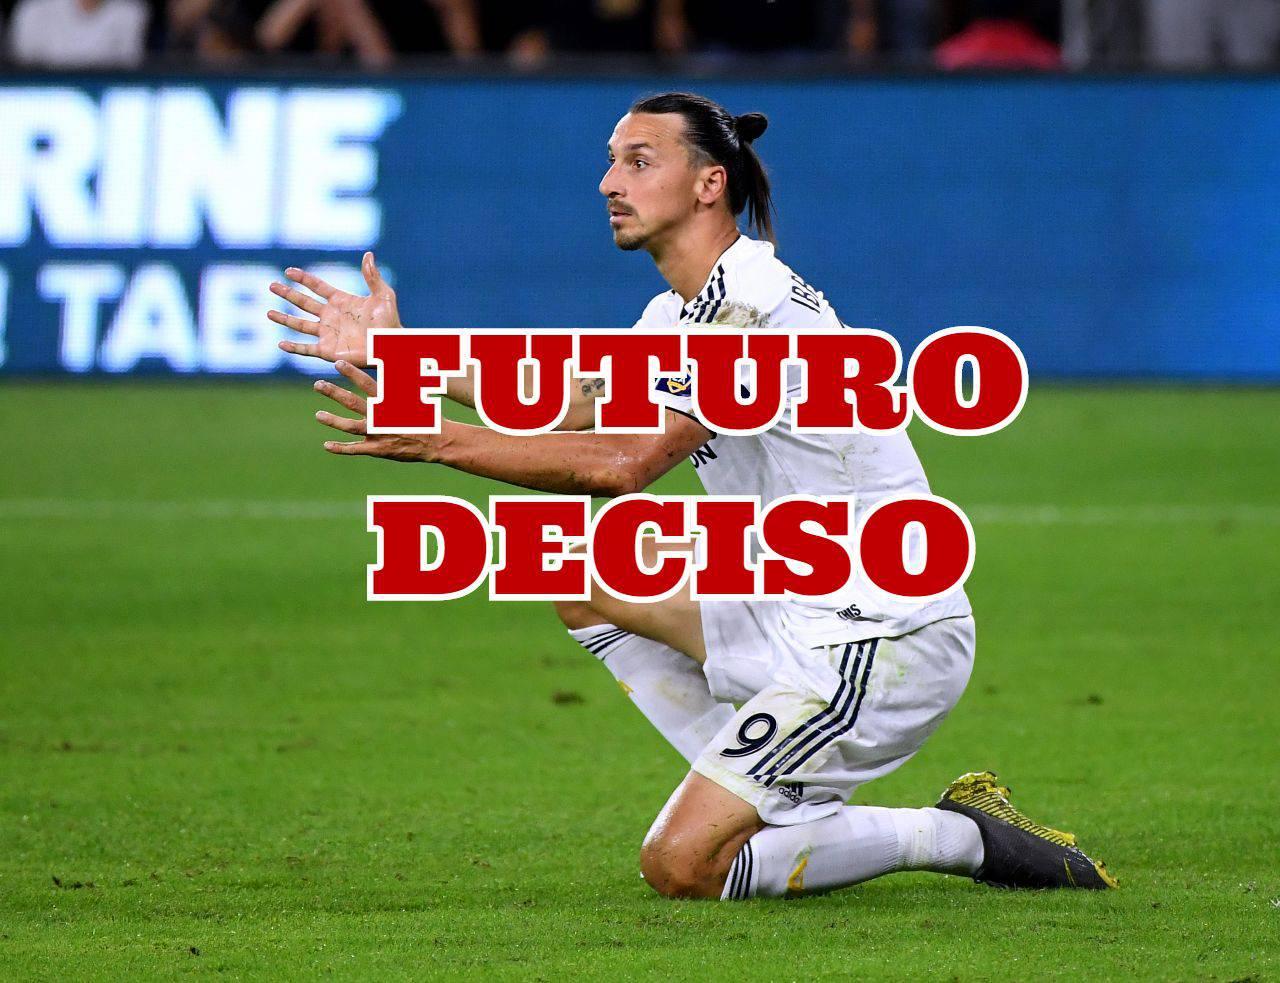 Ibrahimovic futuro